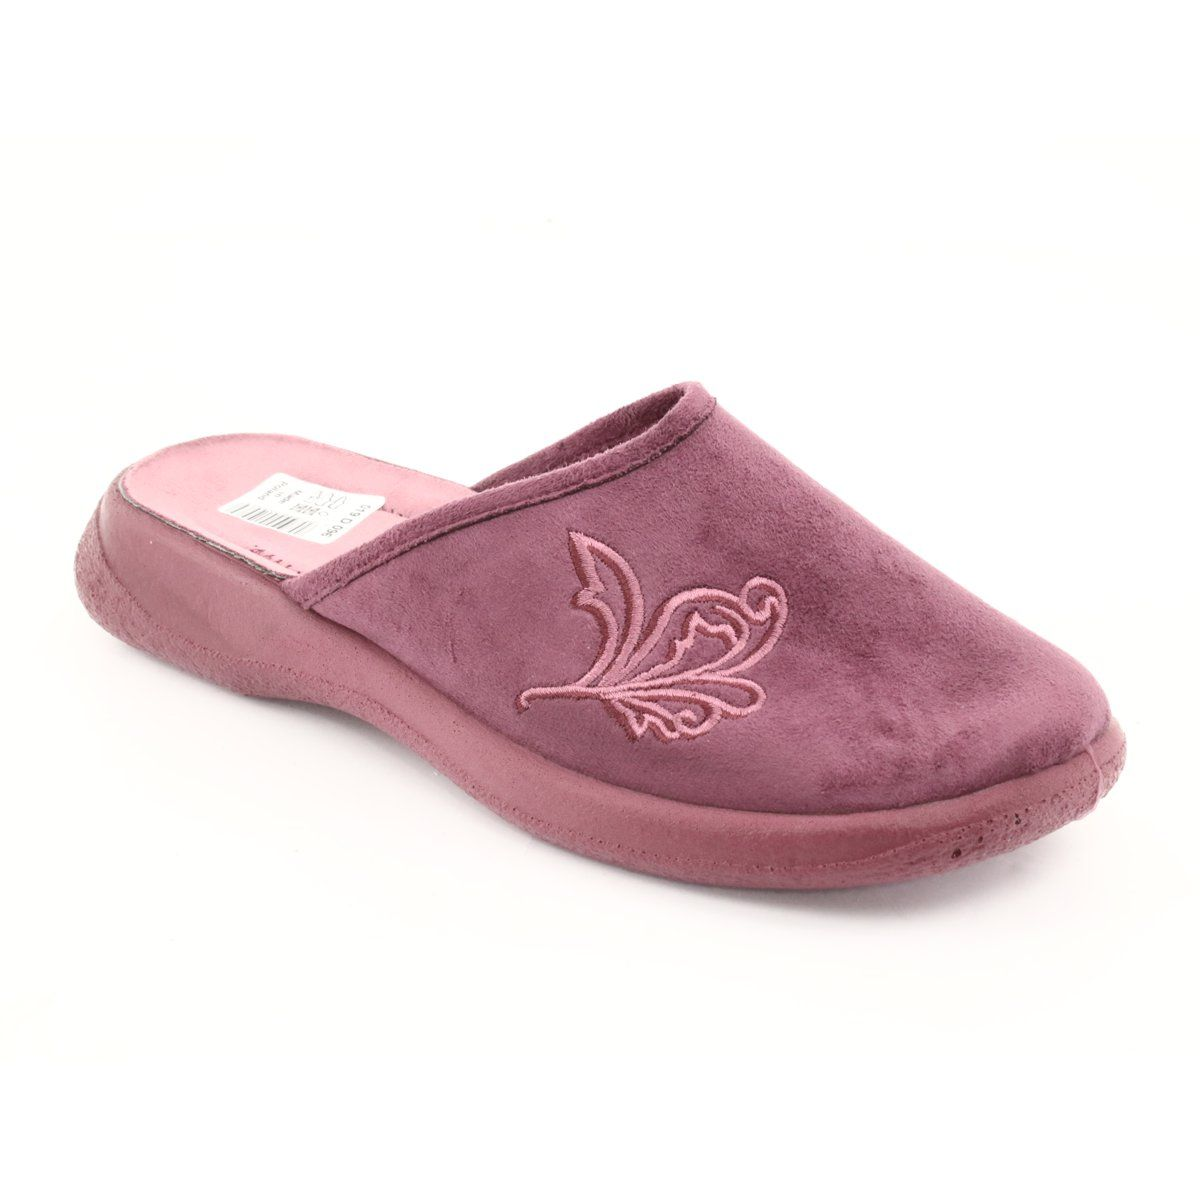 Befado Obuwie Damskie Pu 019d096 Fioletowe Women Shoes Homemade Shoes Womens Slippers